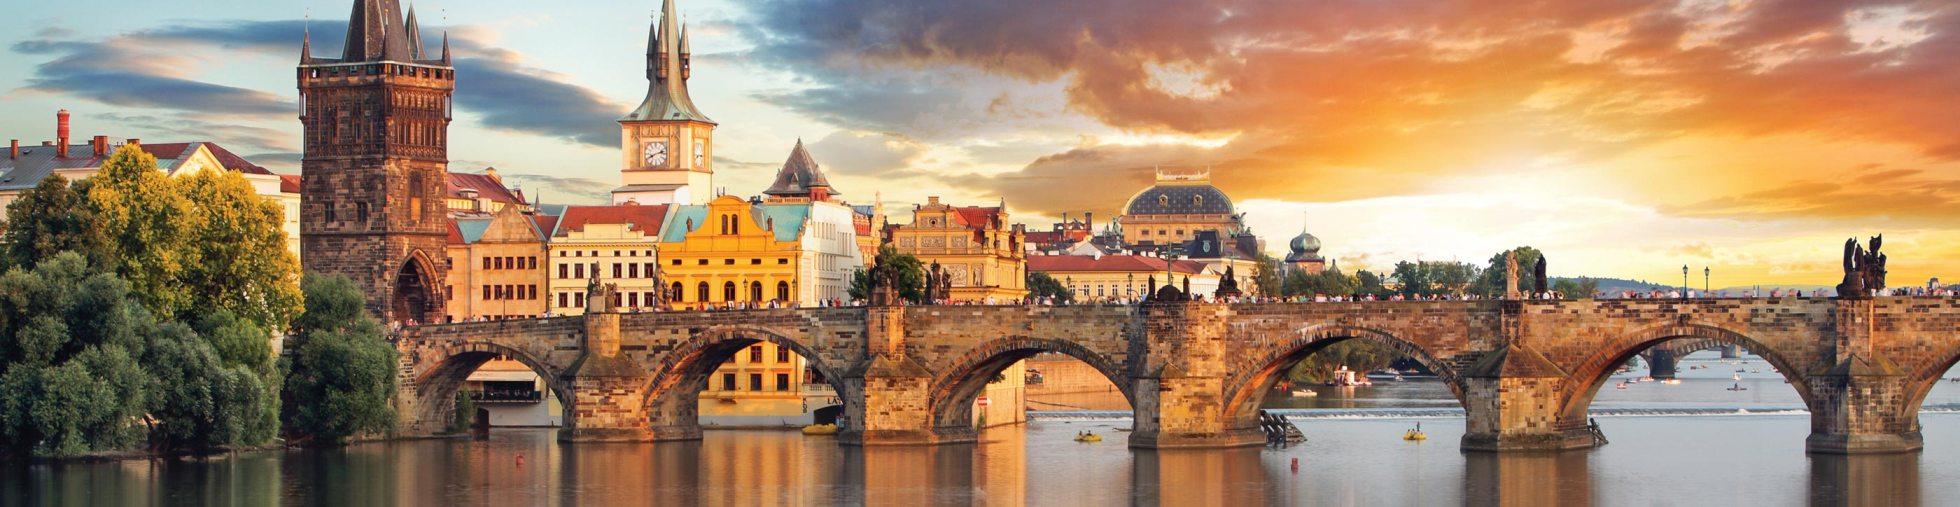 PRAG NOVA GODINA 2017